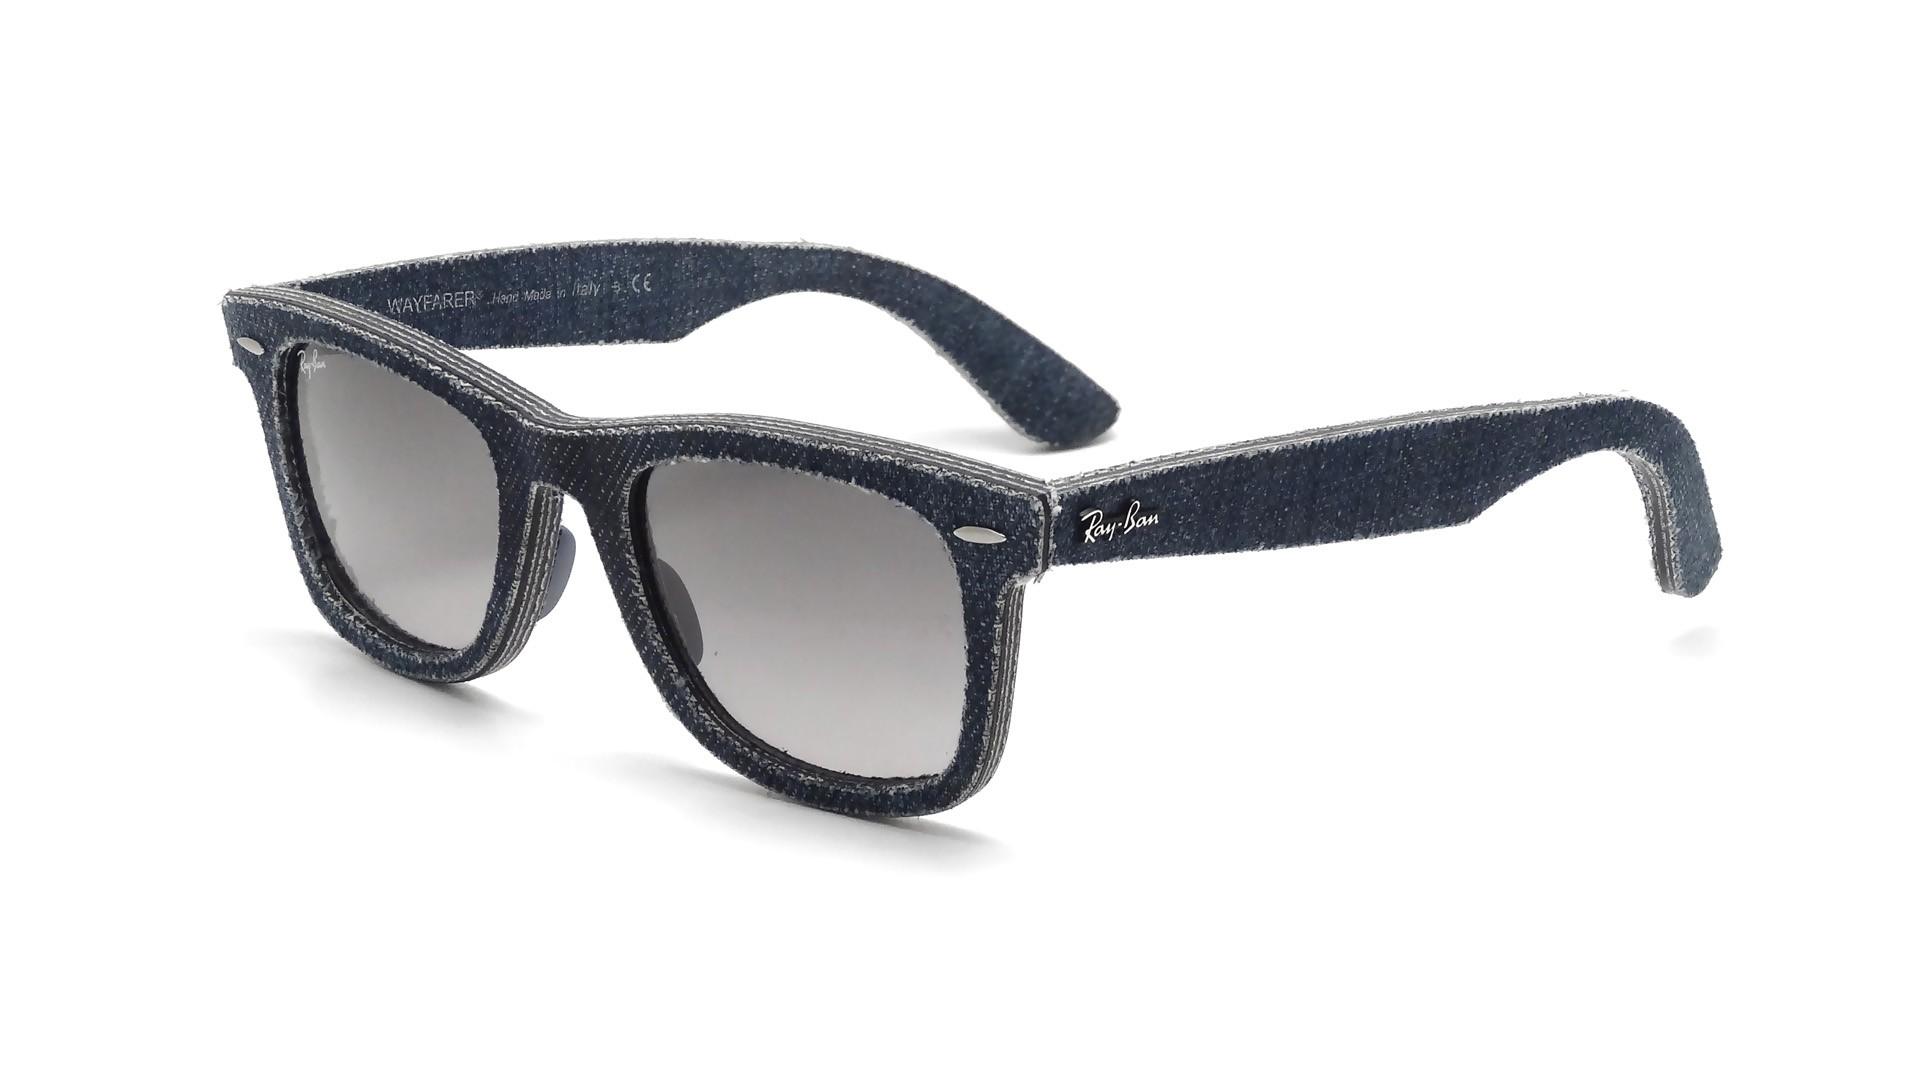 a48eb04c541 Sunglasses Ray-Ban Original Wayfarer Denim Blue RB2140 1163 71 50-18 Medium  Gradient